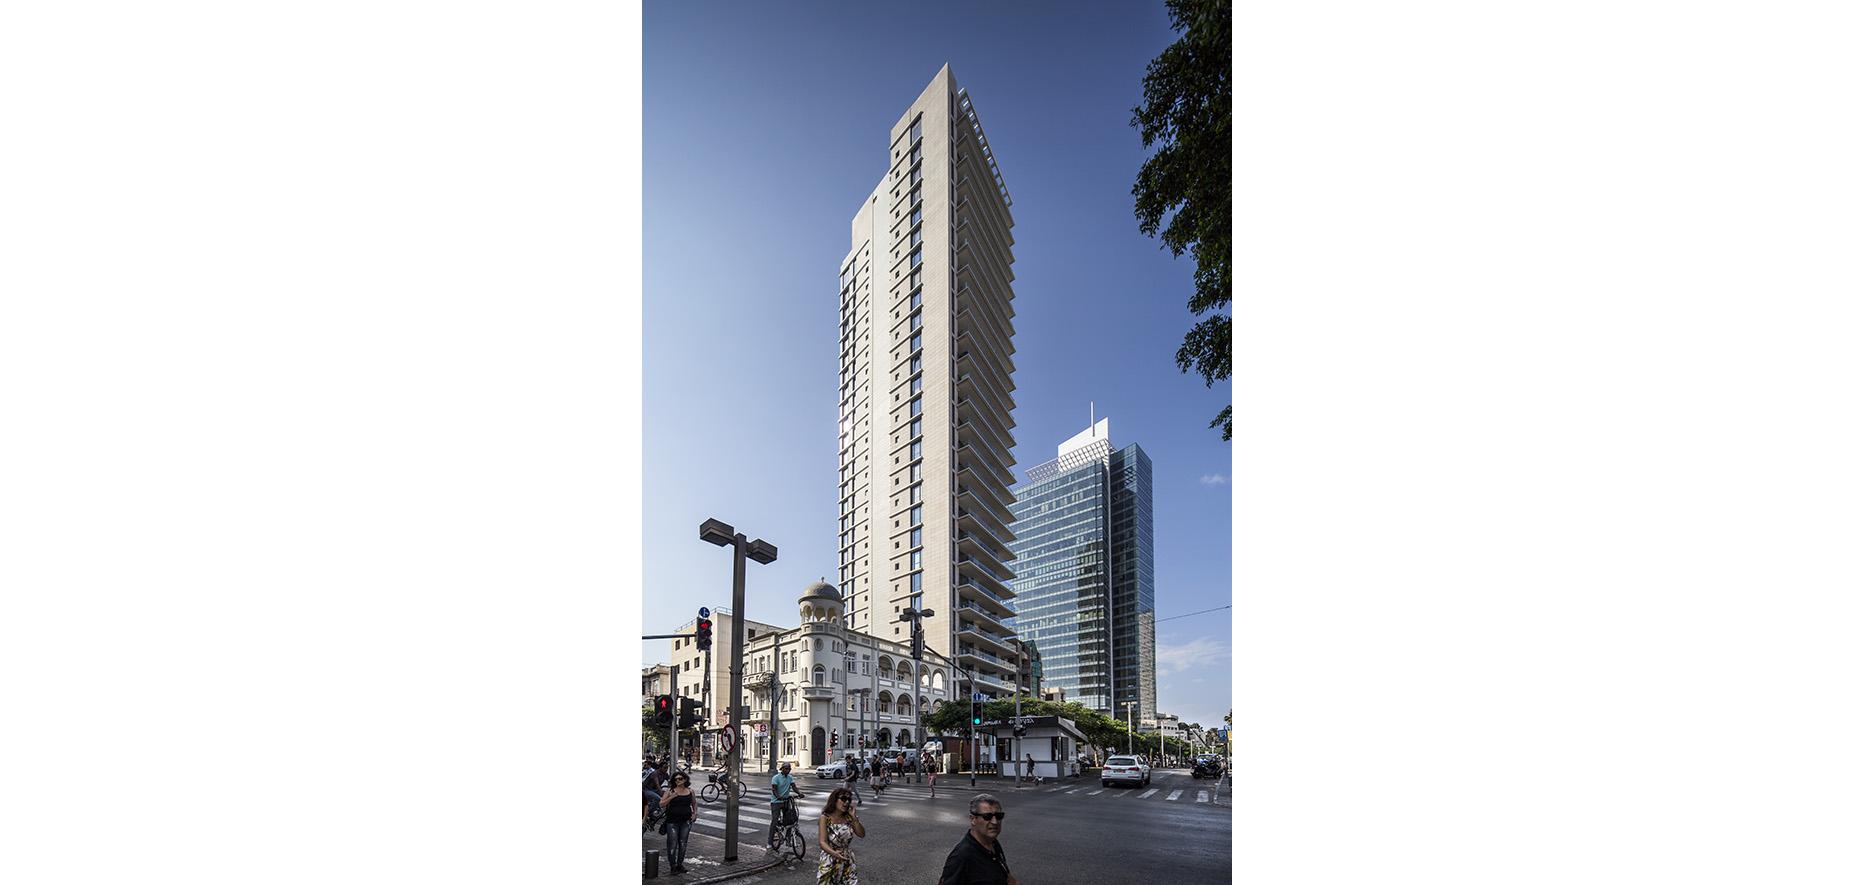 Rothschild_30_Tower_Tel_Aviv_planned_By_Kolker_Epstein_Architects5